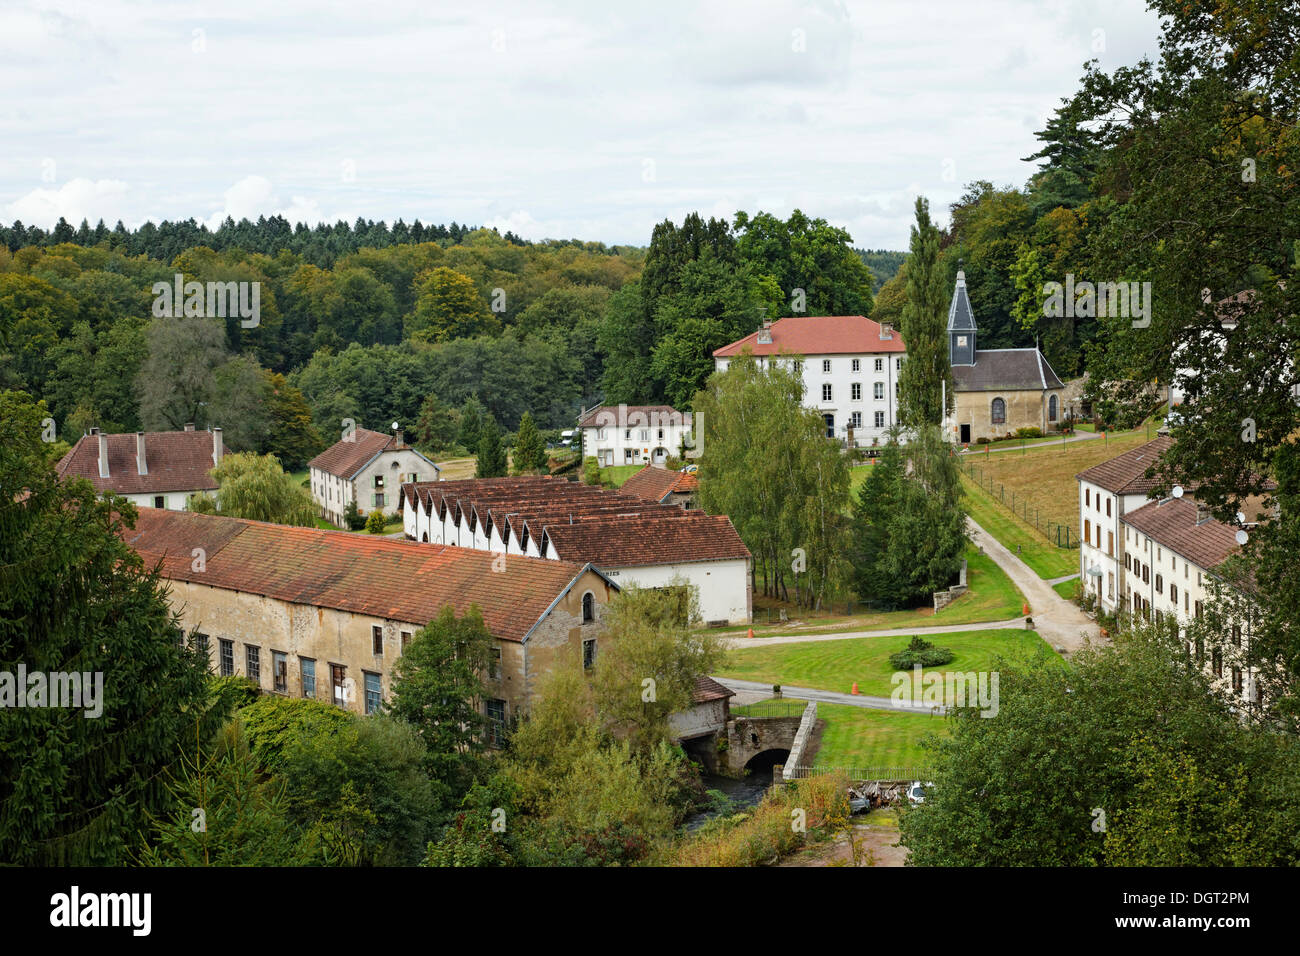 La Manufacture Royal des Bains, antiguamente la mayor fábrica de hojalata en Francia, Bains-les-Bains, Epinal, Lorena Imagen De Stock